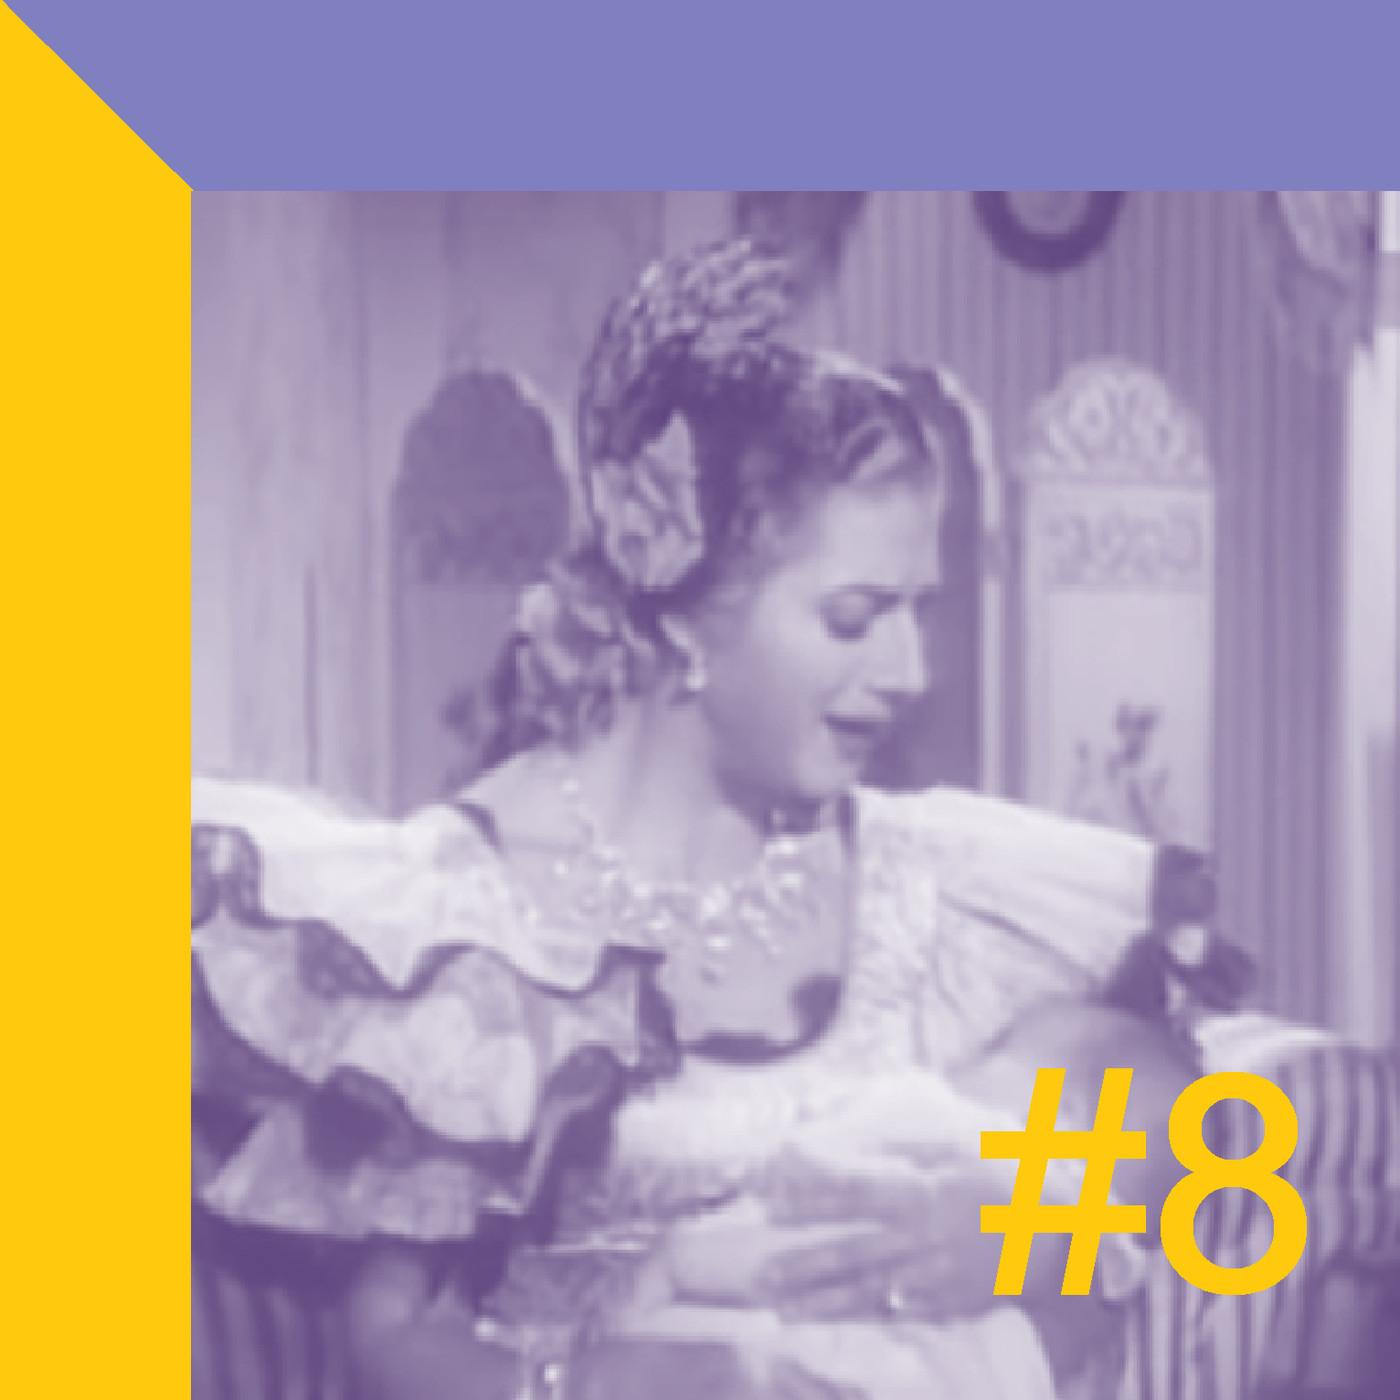 ¡Ay, campaneras! #8 Madres